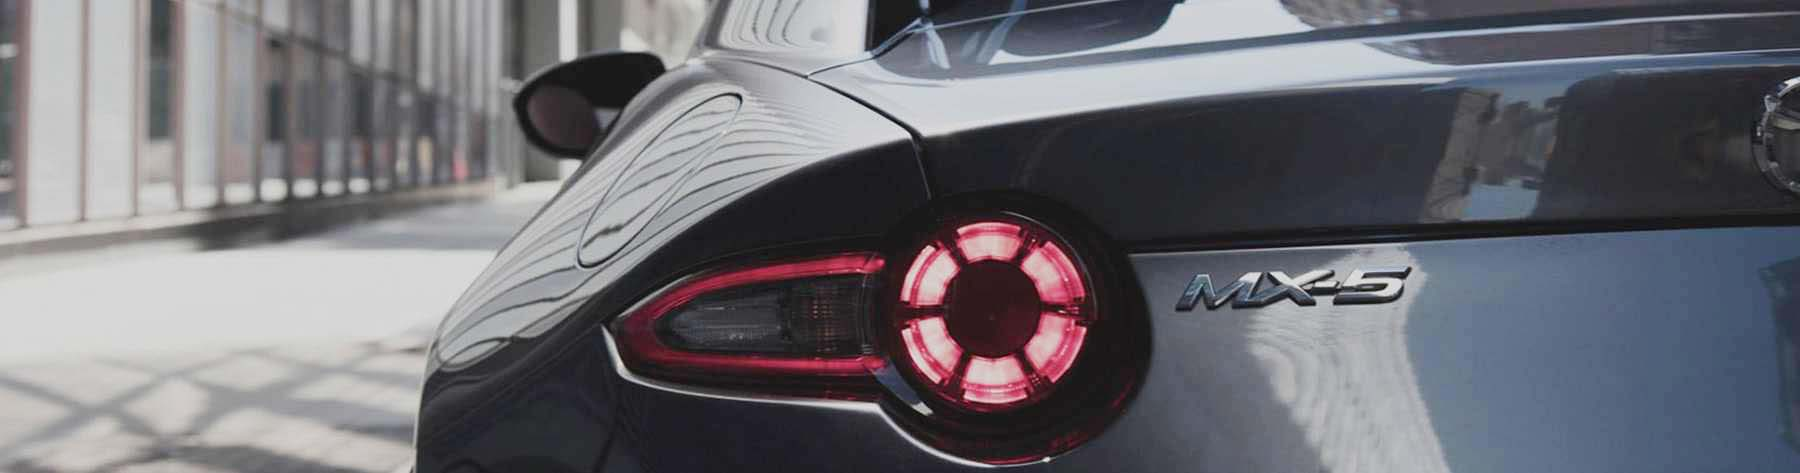 Mazda warranty